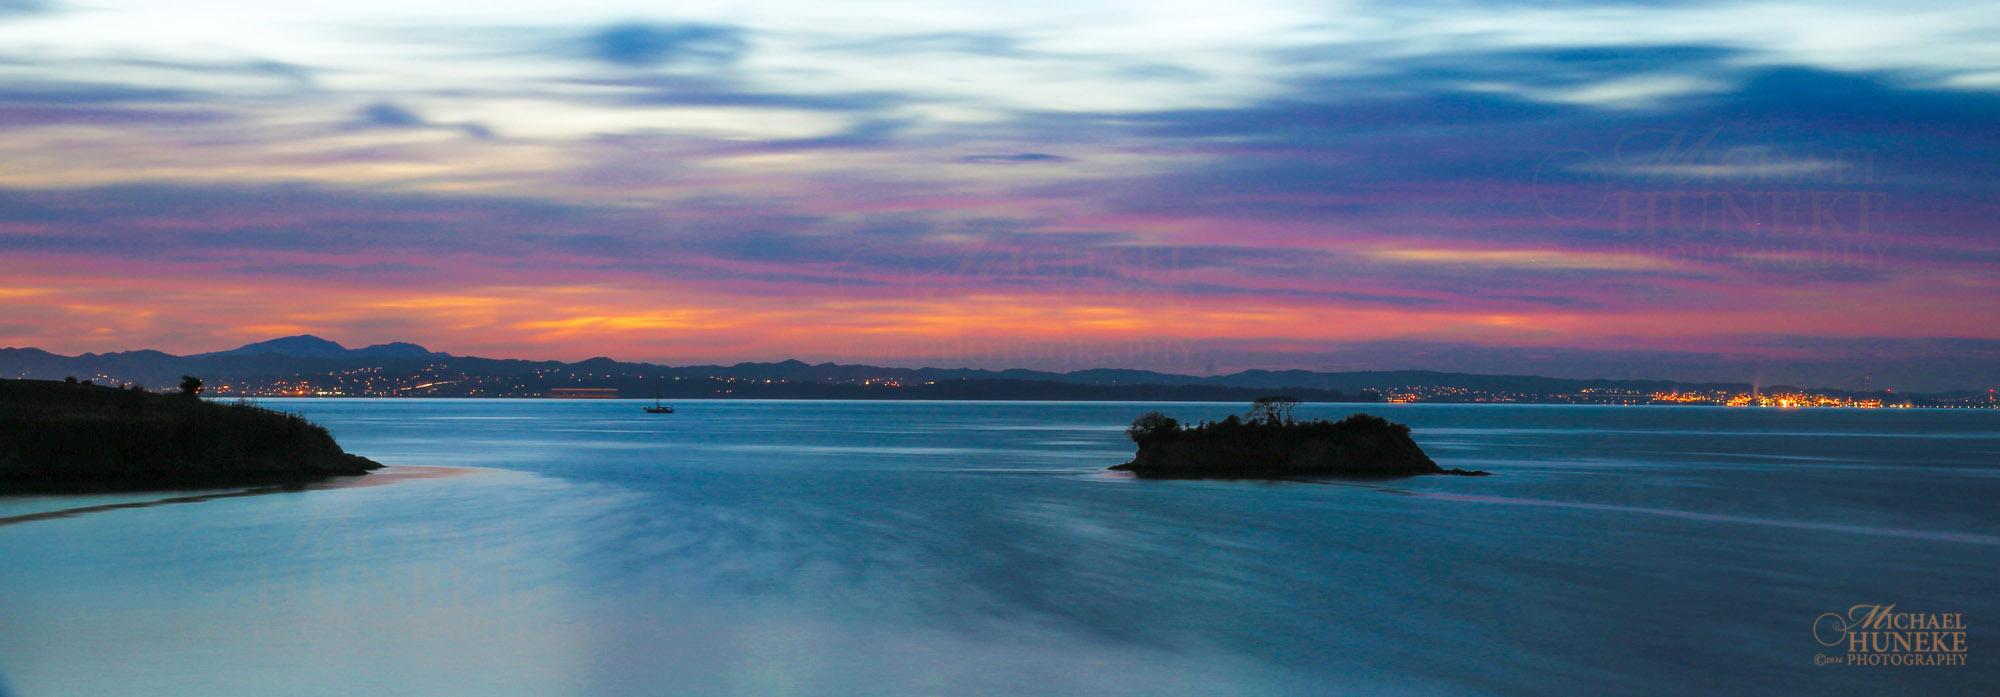 China_Beach_Sunrise_Island-QN9A4720 2000 wide 72dpi high(9) wm.jpg